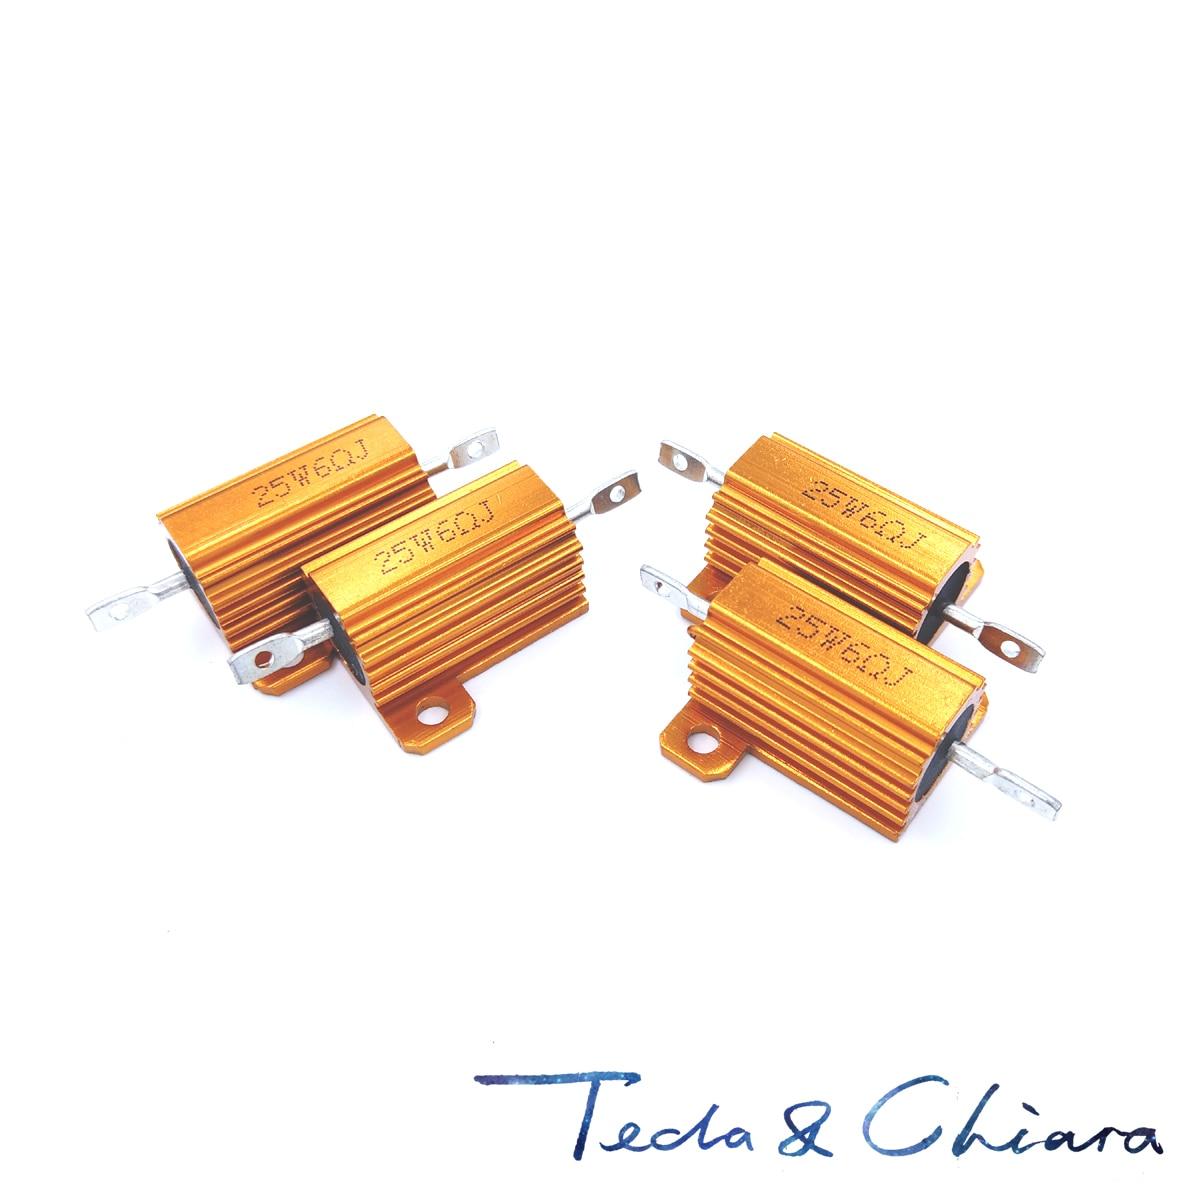 5 pçs 120r 120ohm 120 12r 12ohm 12 r ohm 25 w watt wirewound alumínio potência metal escudo caso resistência resistor rx24